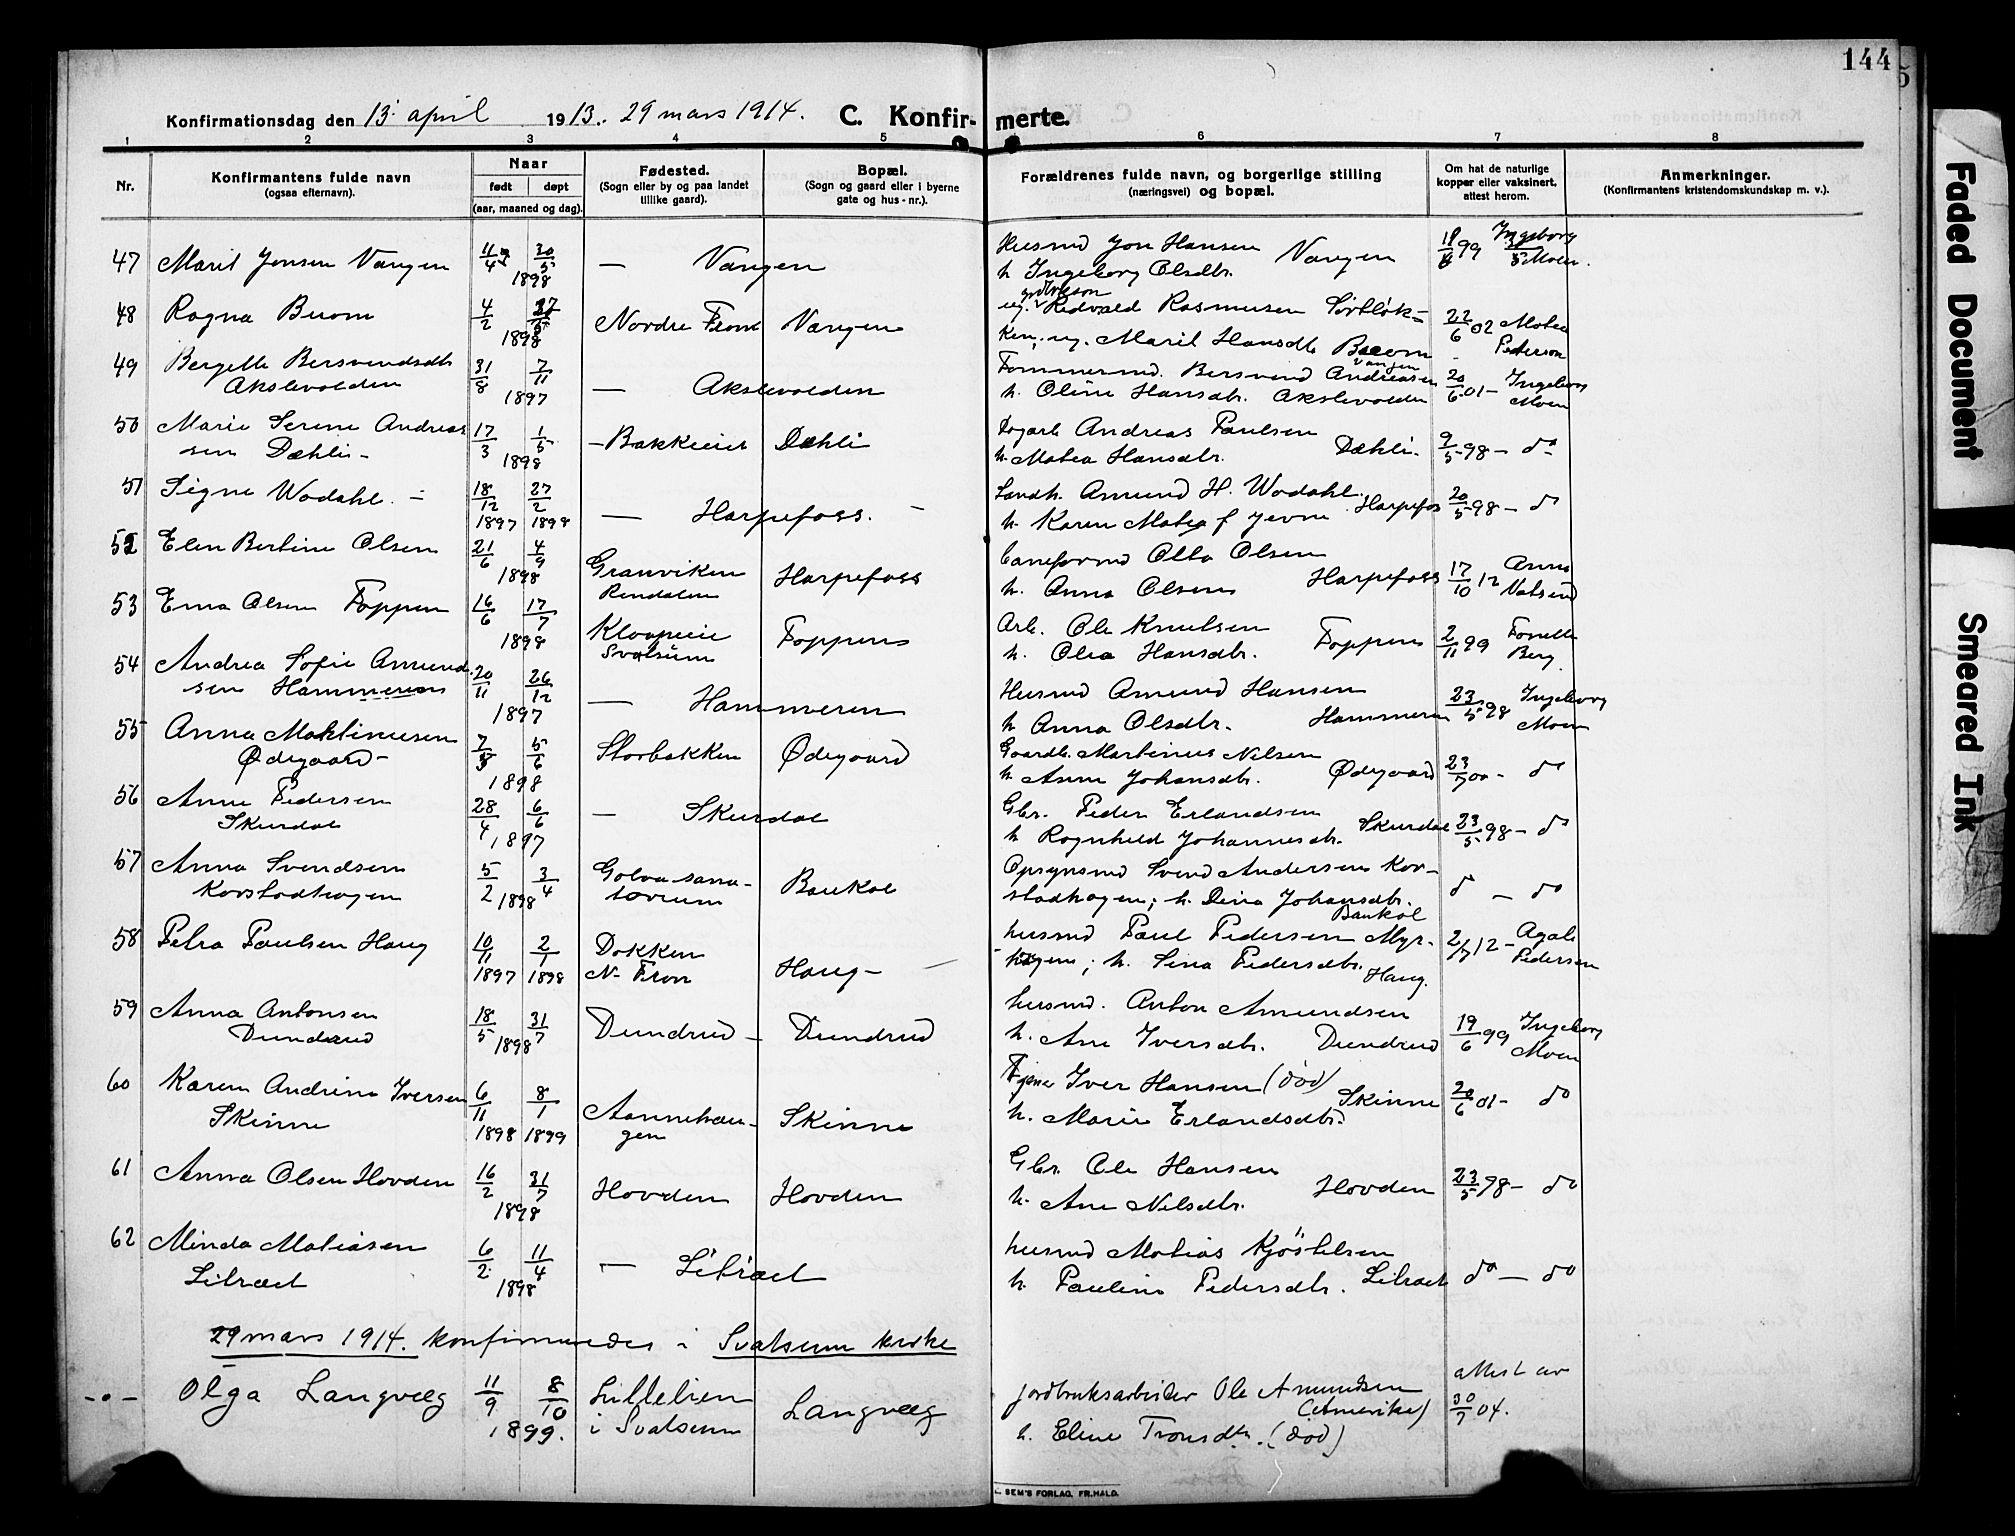 SAH, Sør-Fron prestekontor, H/Ha/Hab/L0005: Klokkerbok nr. 5, 1912-1930, s. 144